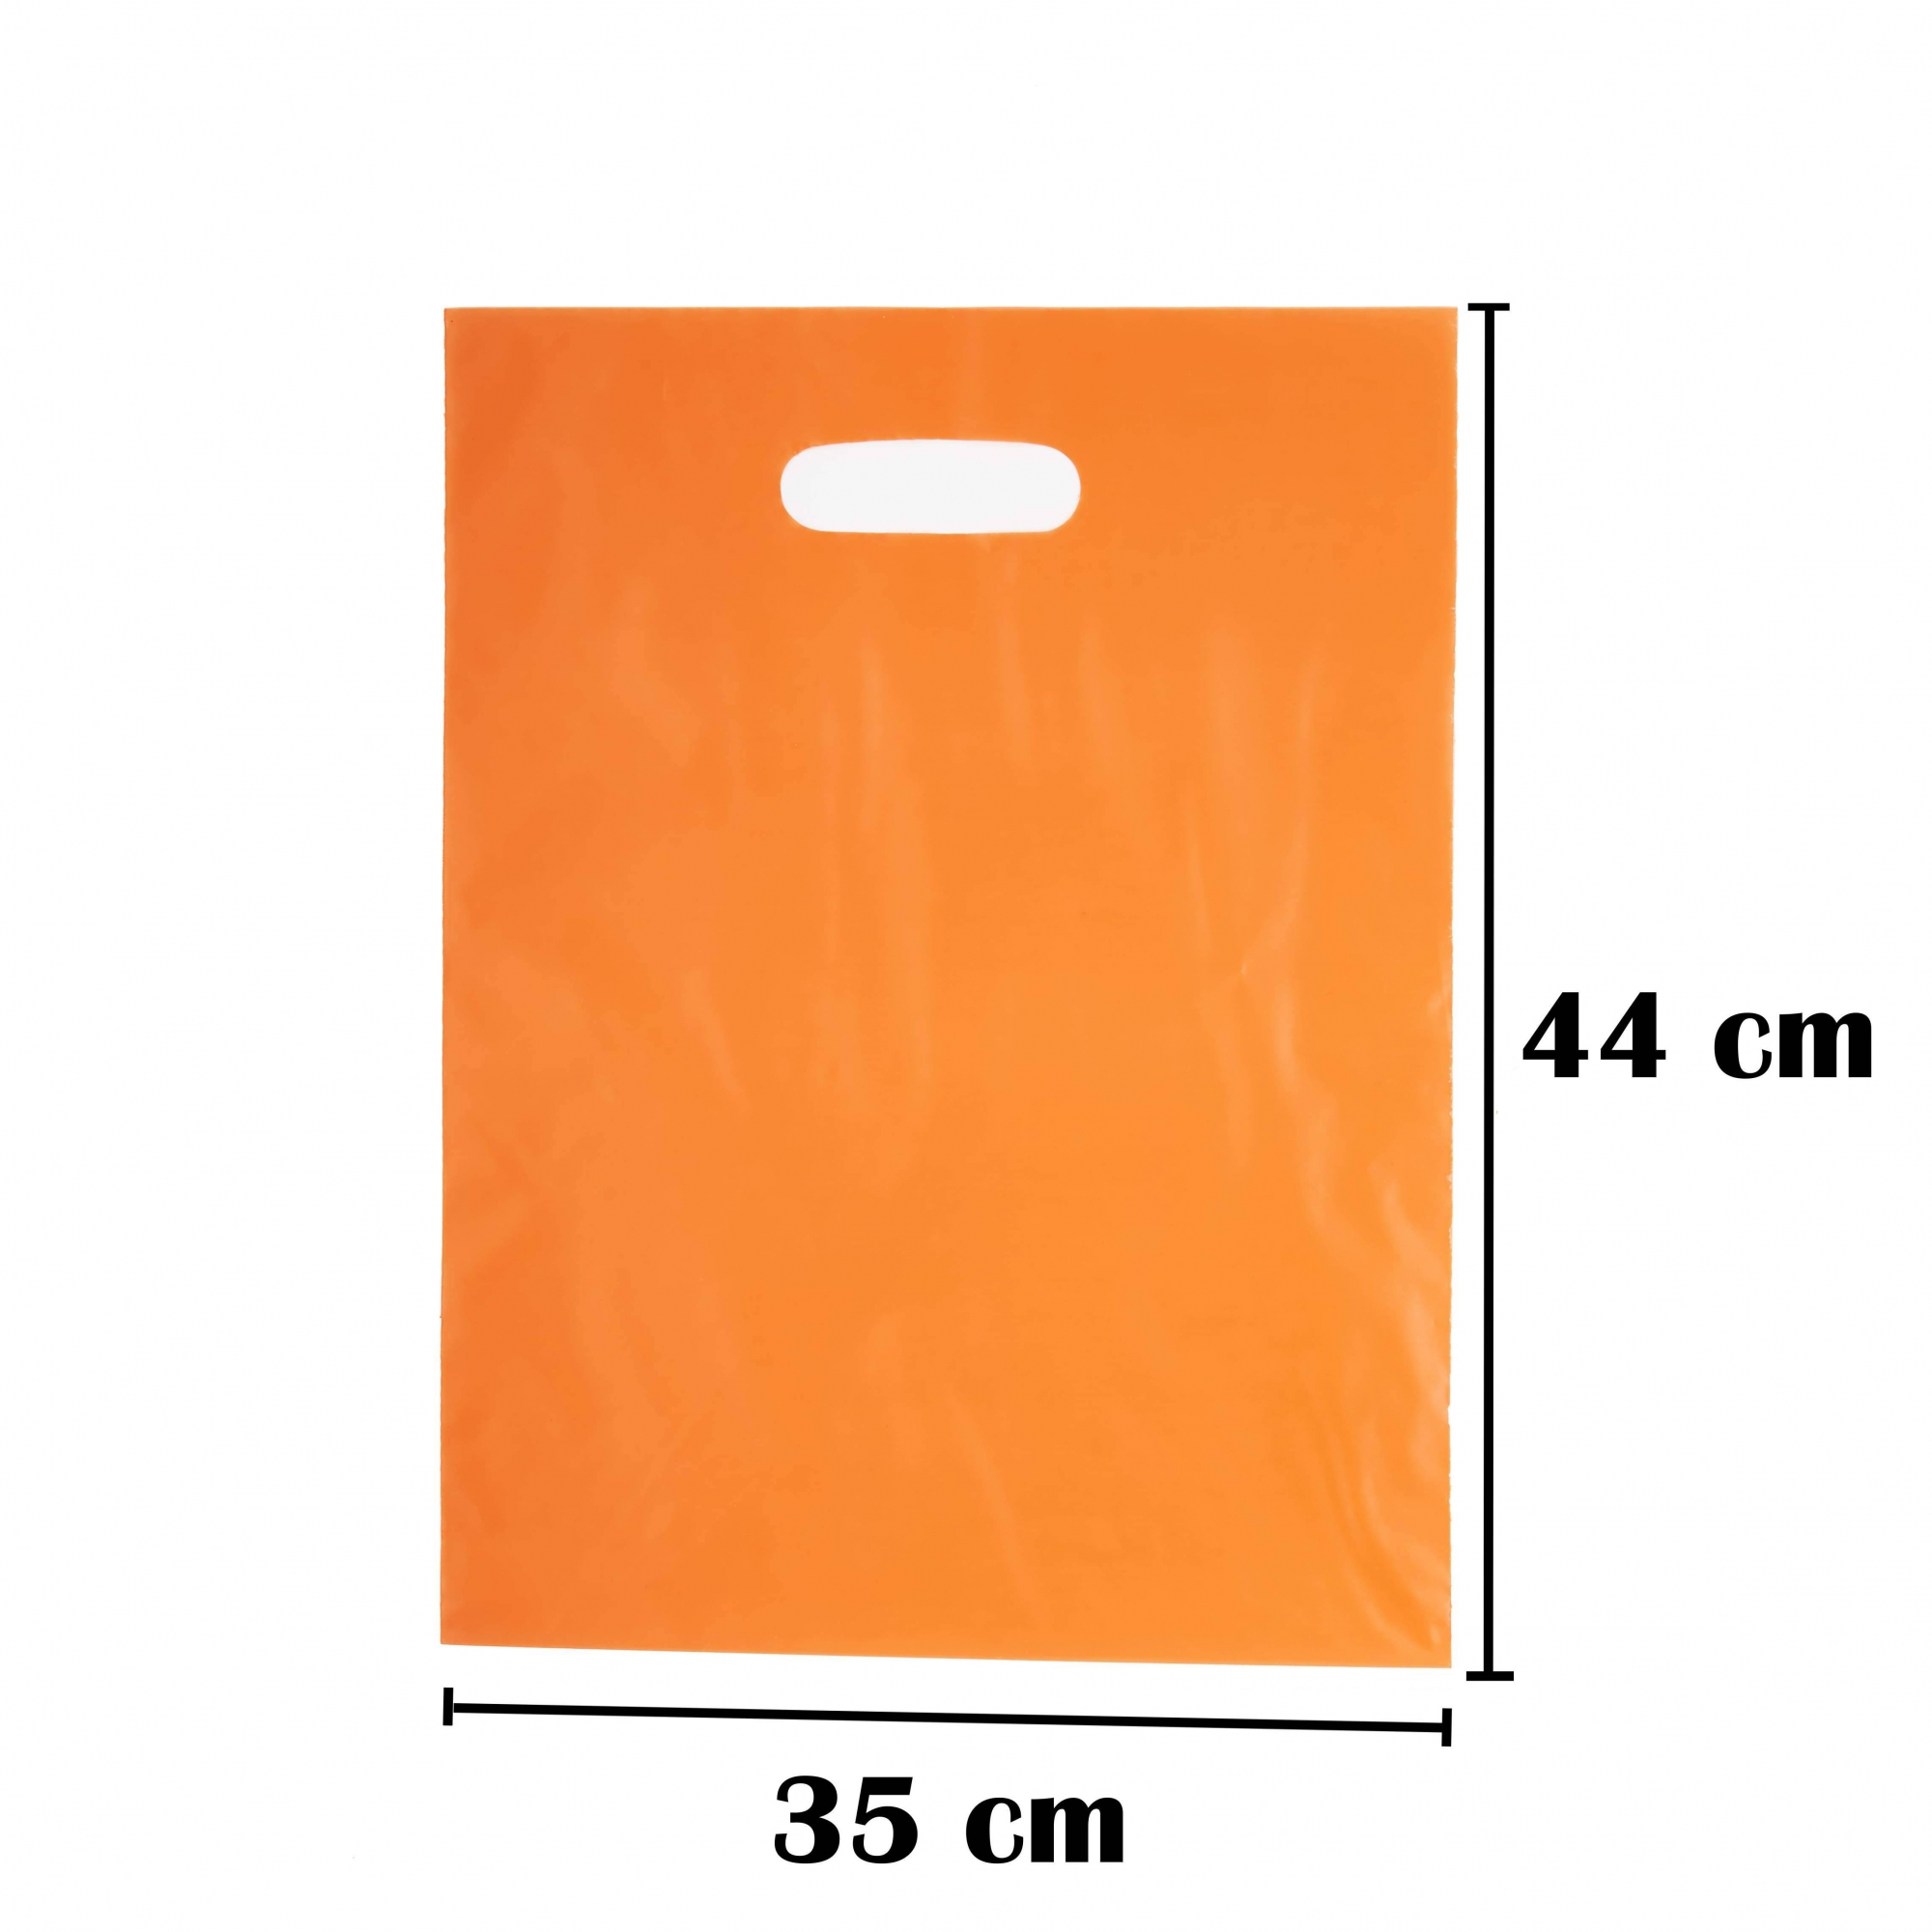 Sacola Plástica 35x44 Laranja Alça Boca de Palhaço 500 Unidades